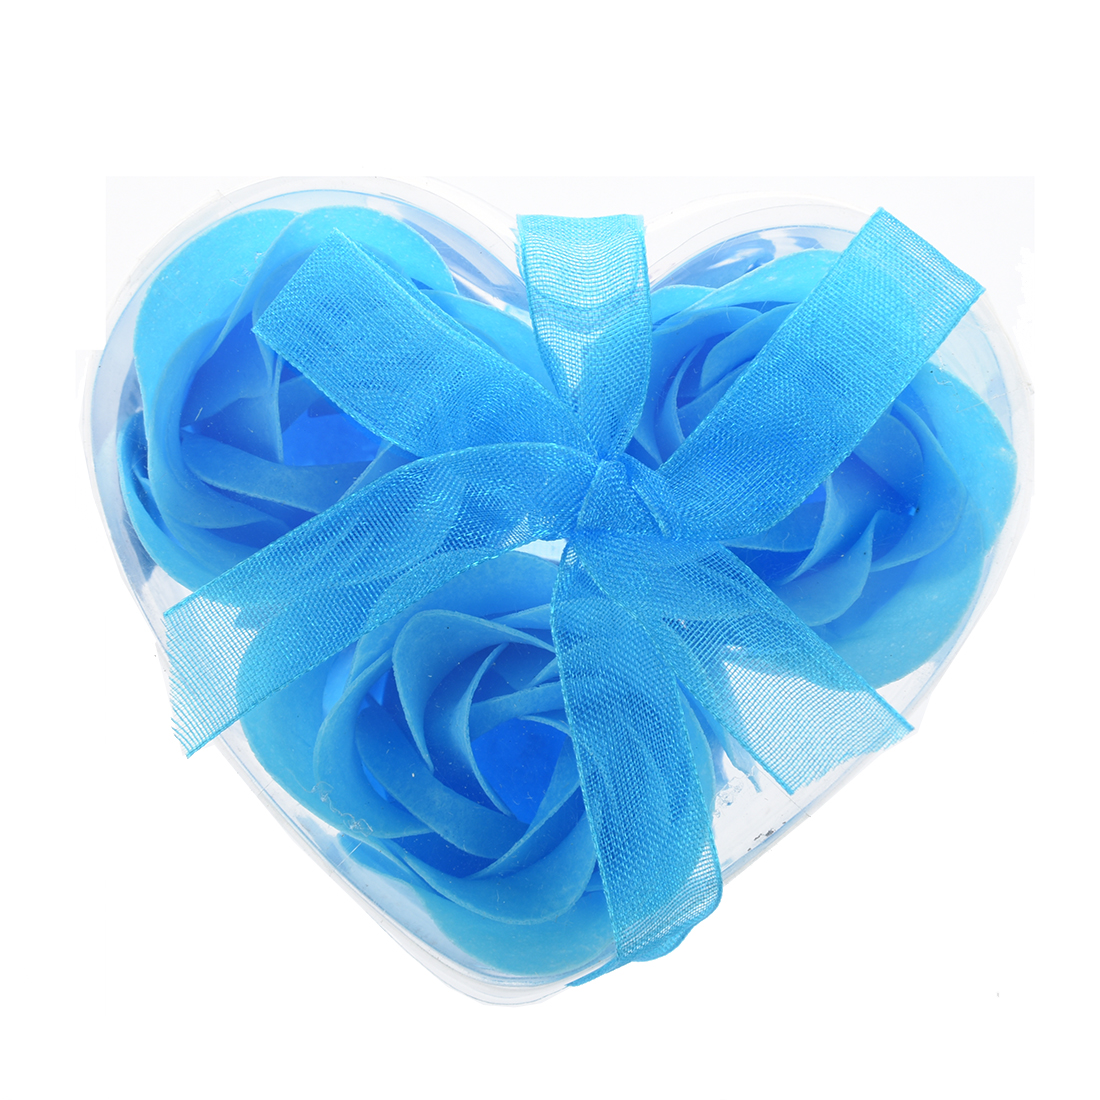 3Pcs Rose Shape Baby Blue Bath Soap Heart Package Box